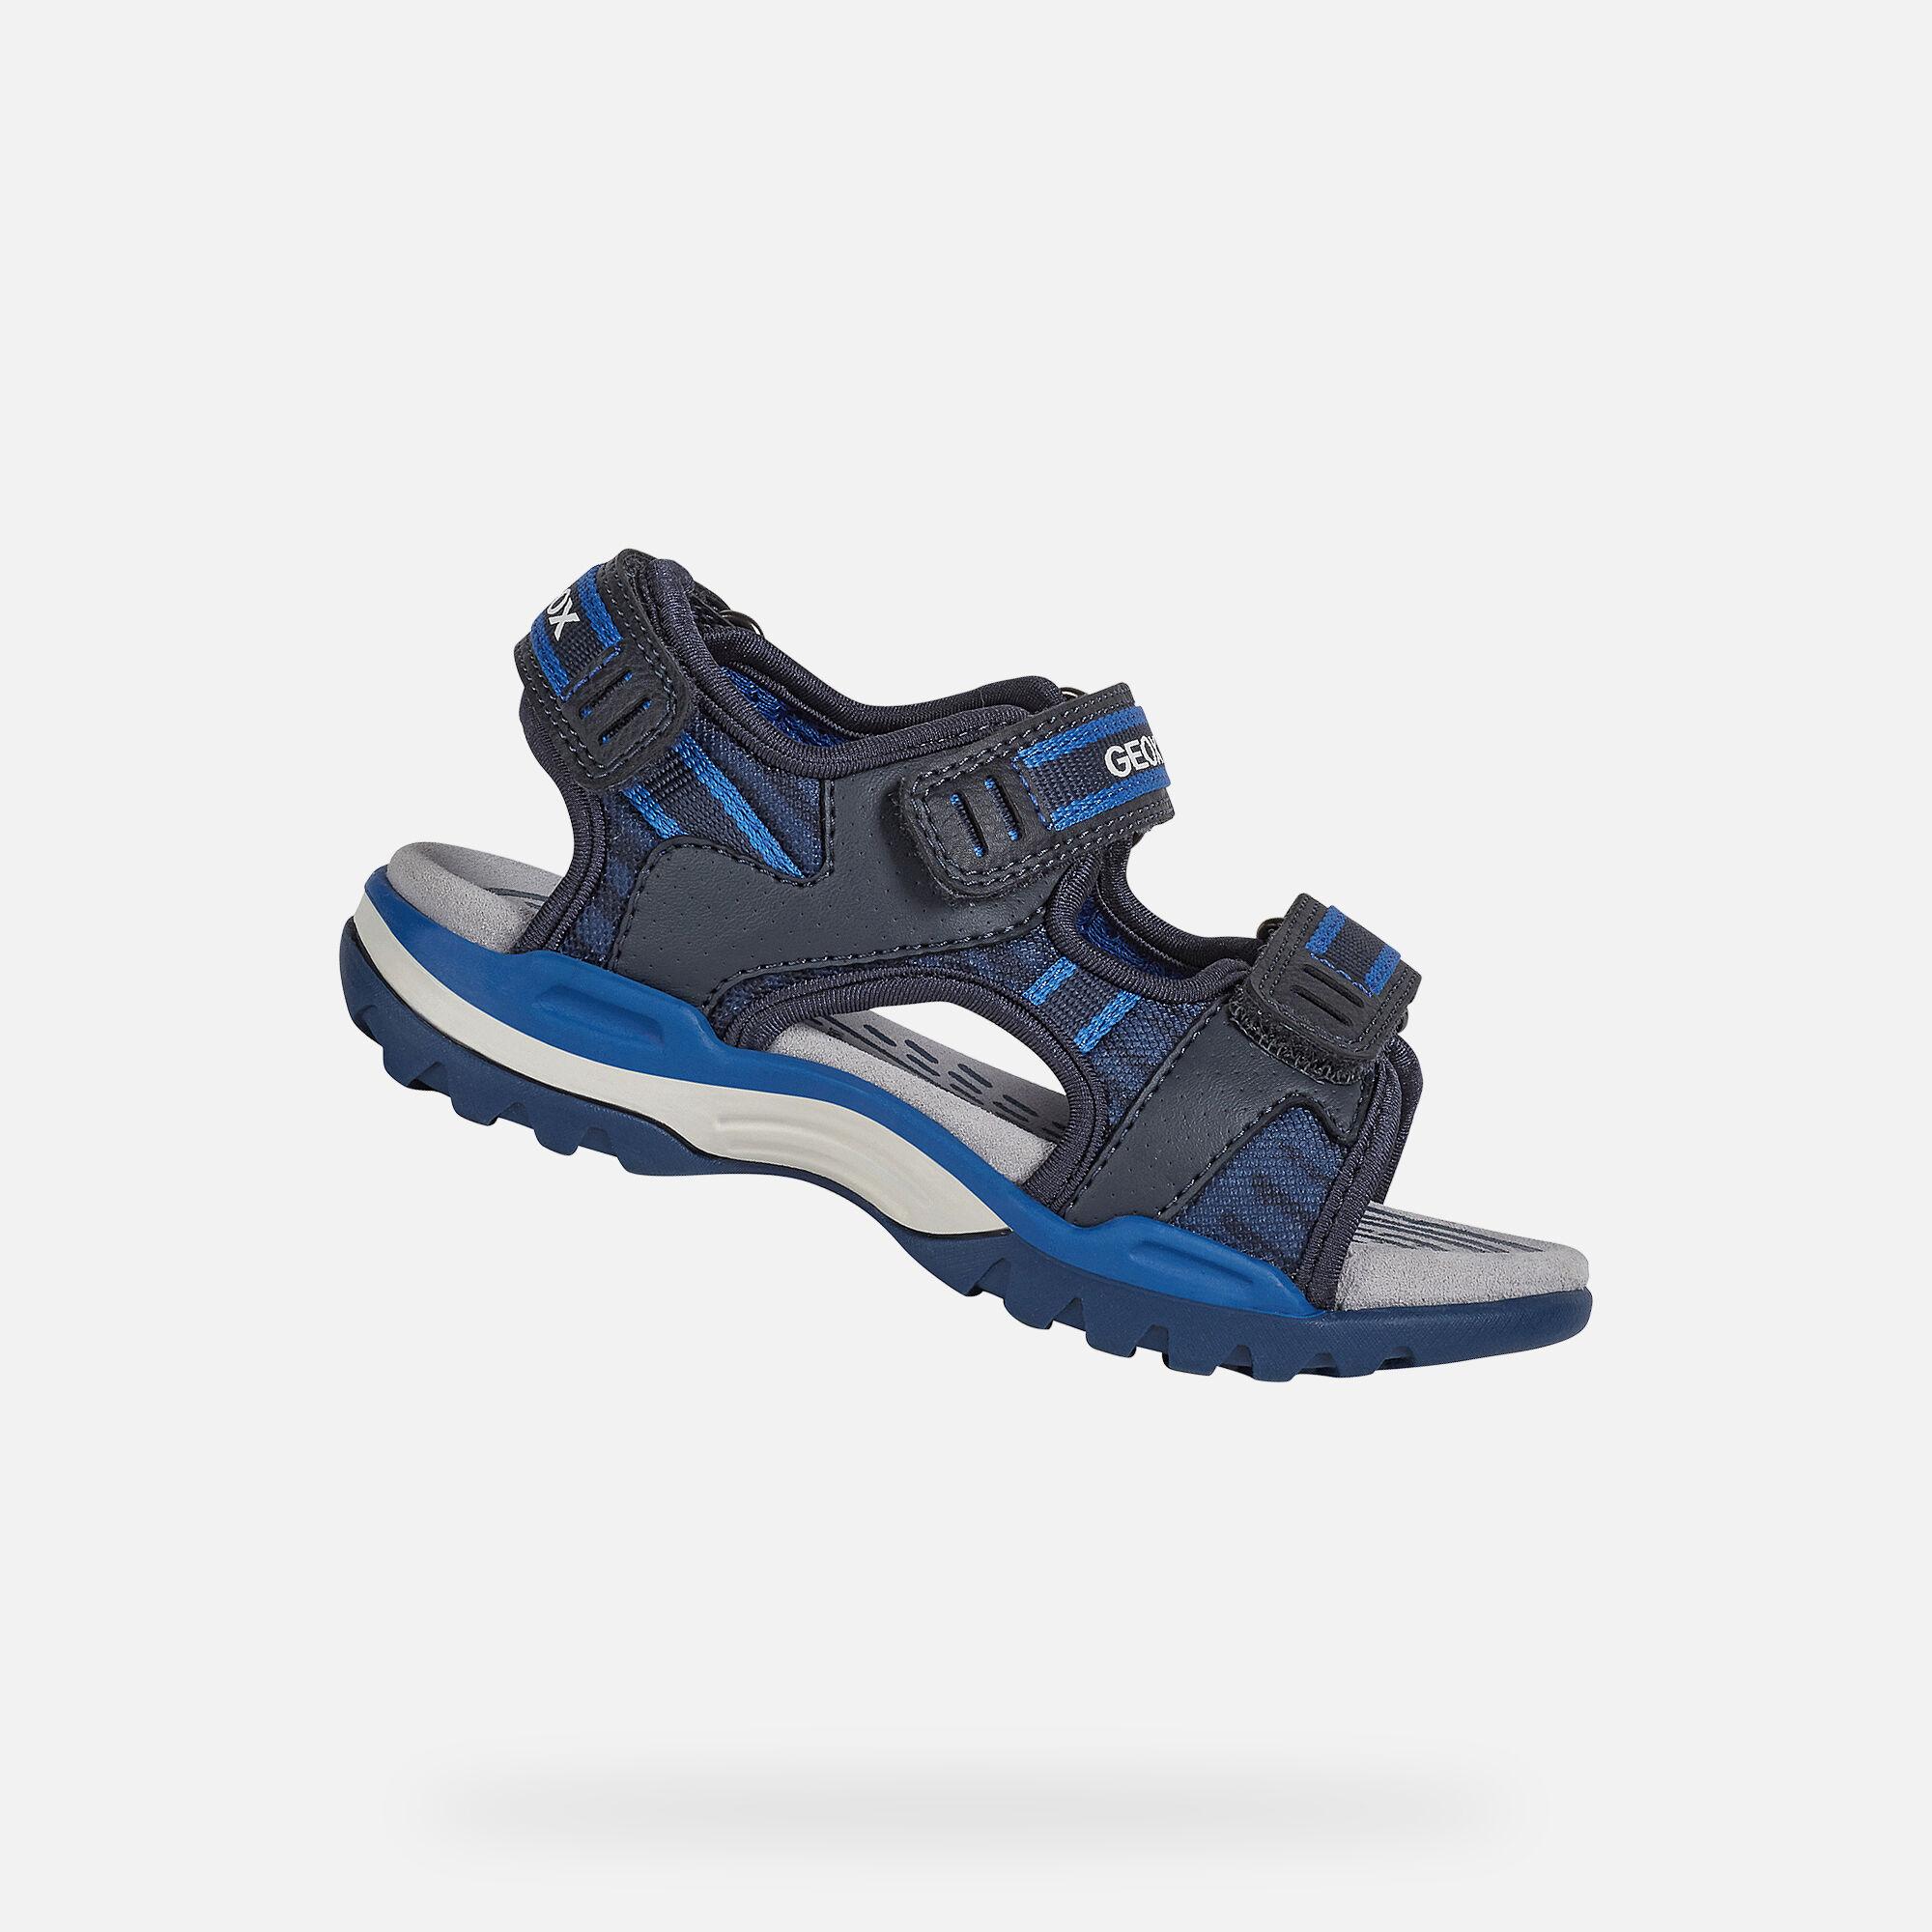 geox respira cheap loafers, geox Boy Sports shoes SANDAL